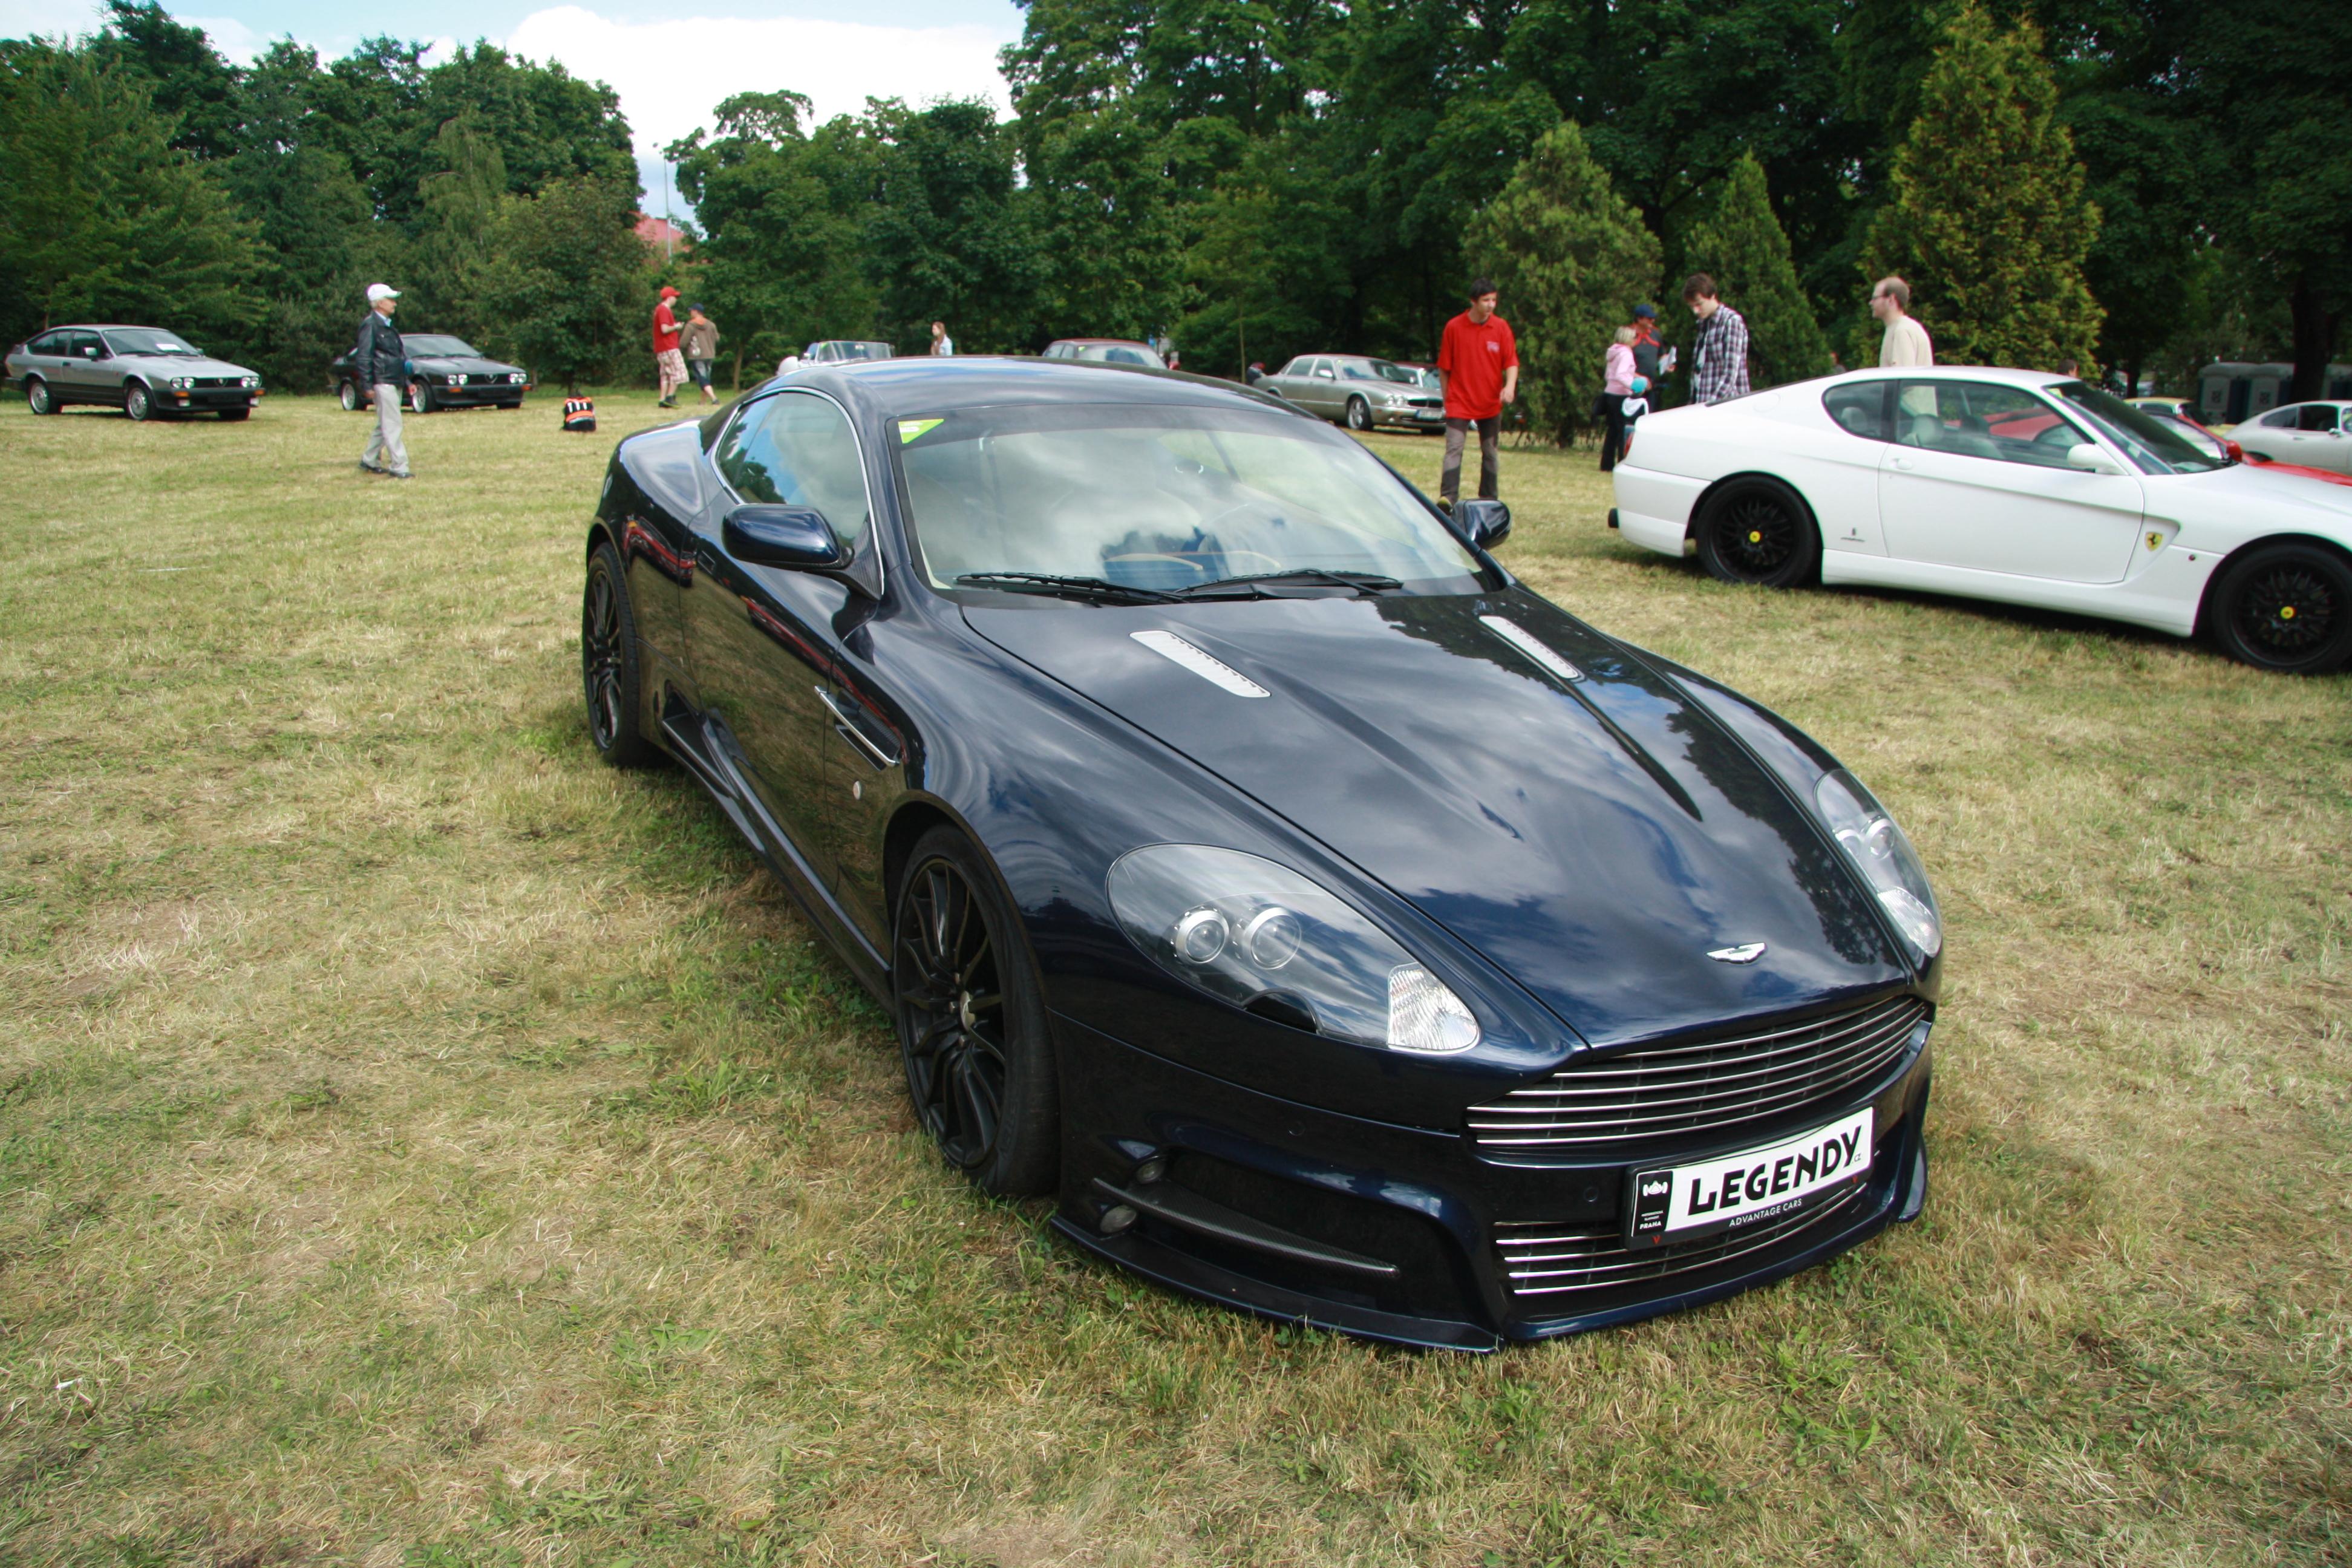 File Aston Martin Db9 At Legendy 2014 Jpg Wikimedia Commons